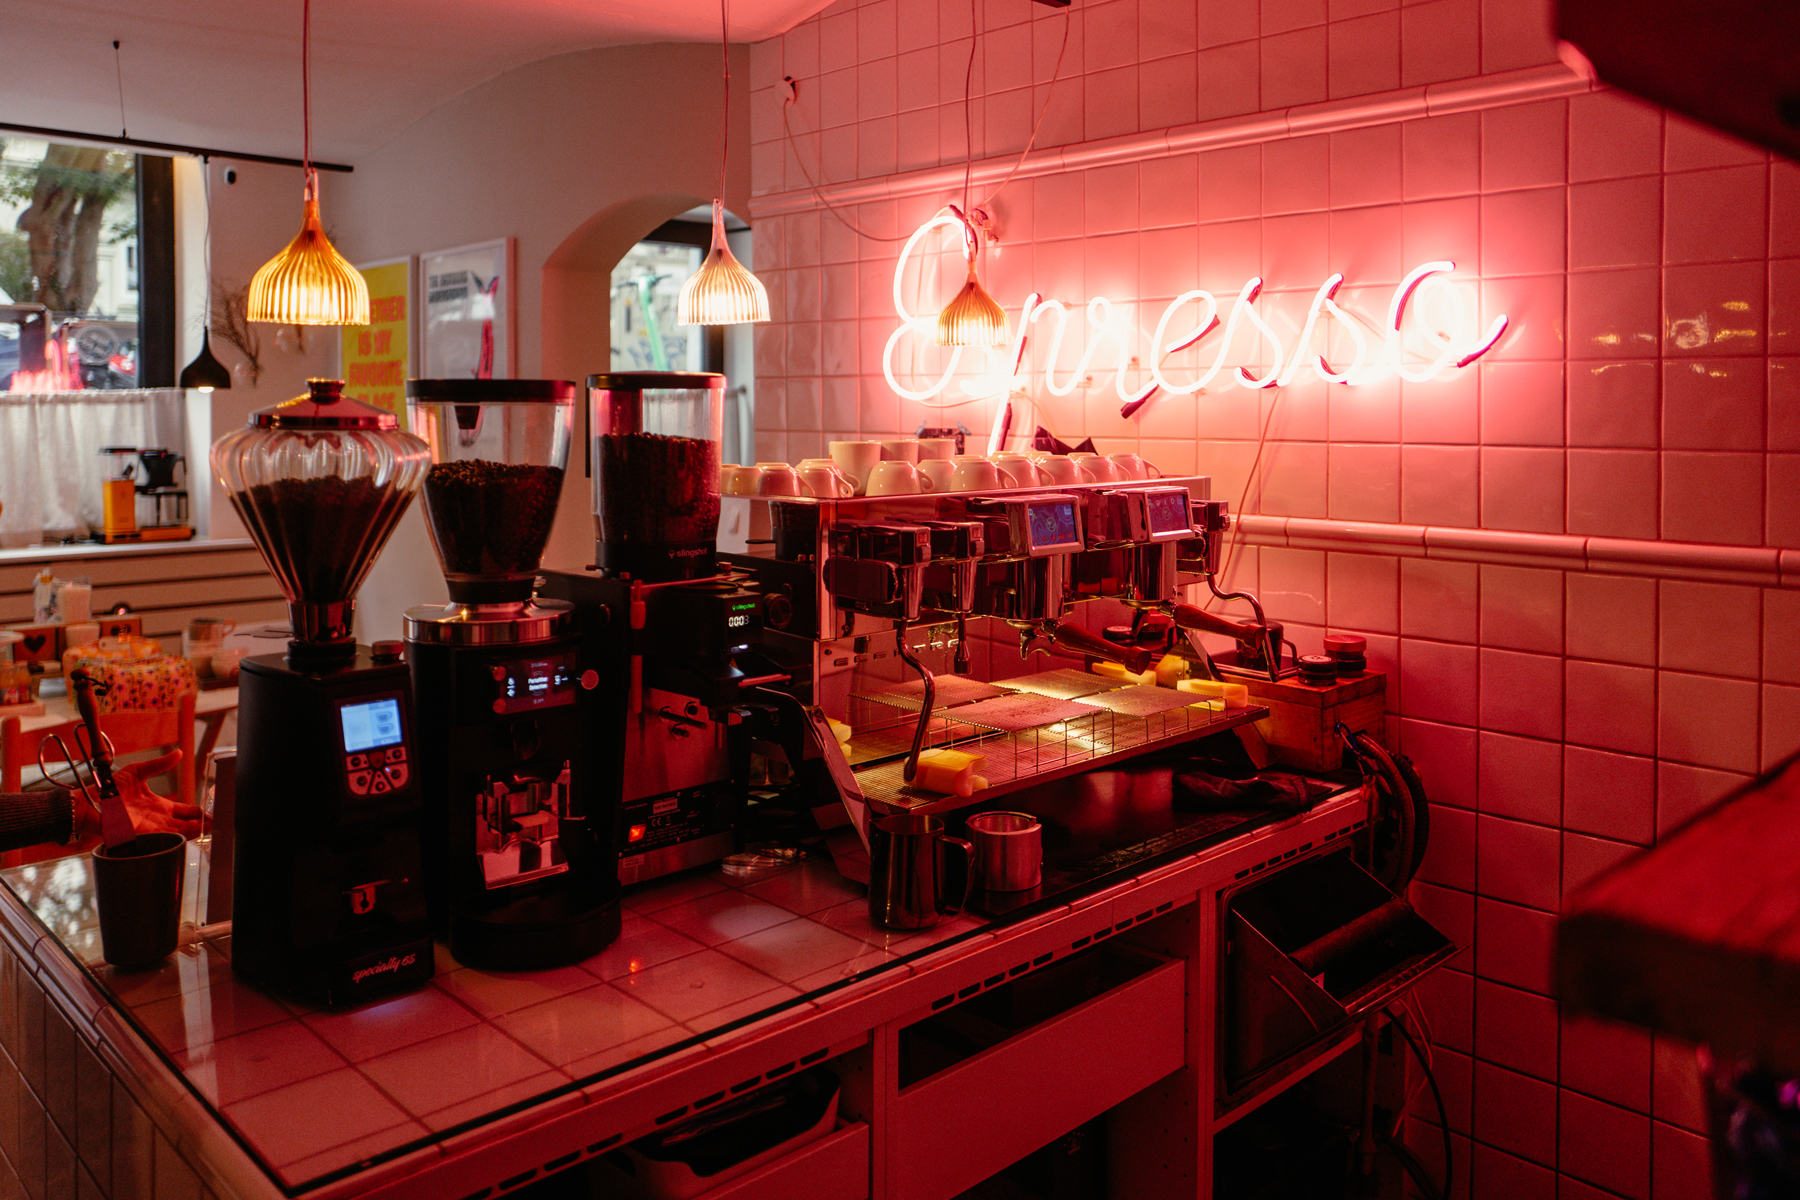 Geheimtipp Hamburg Grindelviertel Café Benvenuto Espresso Dahlina Sophie Kock 23